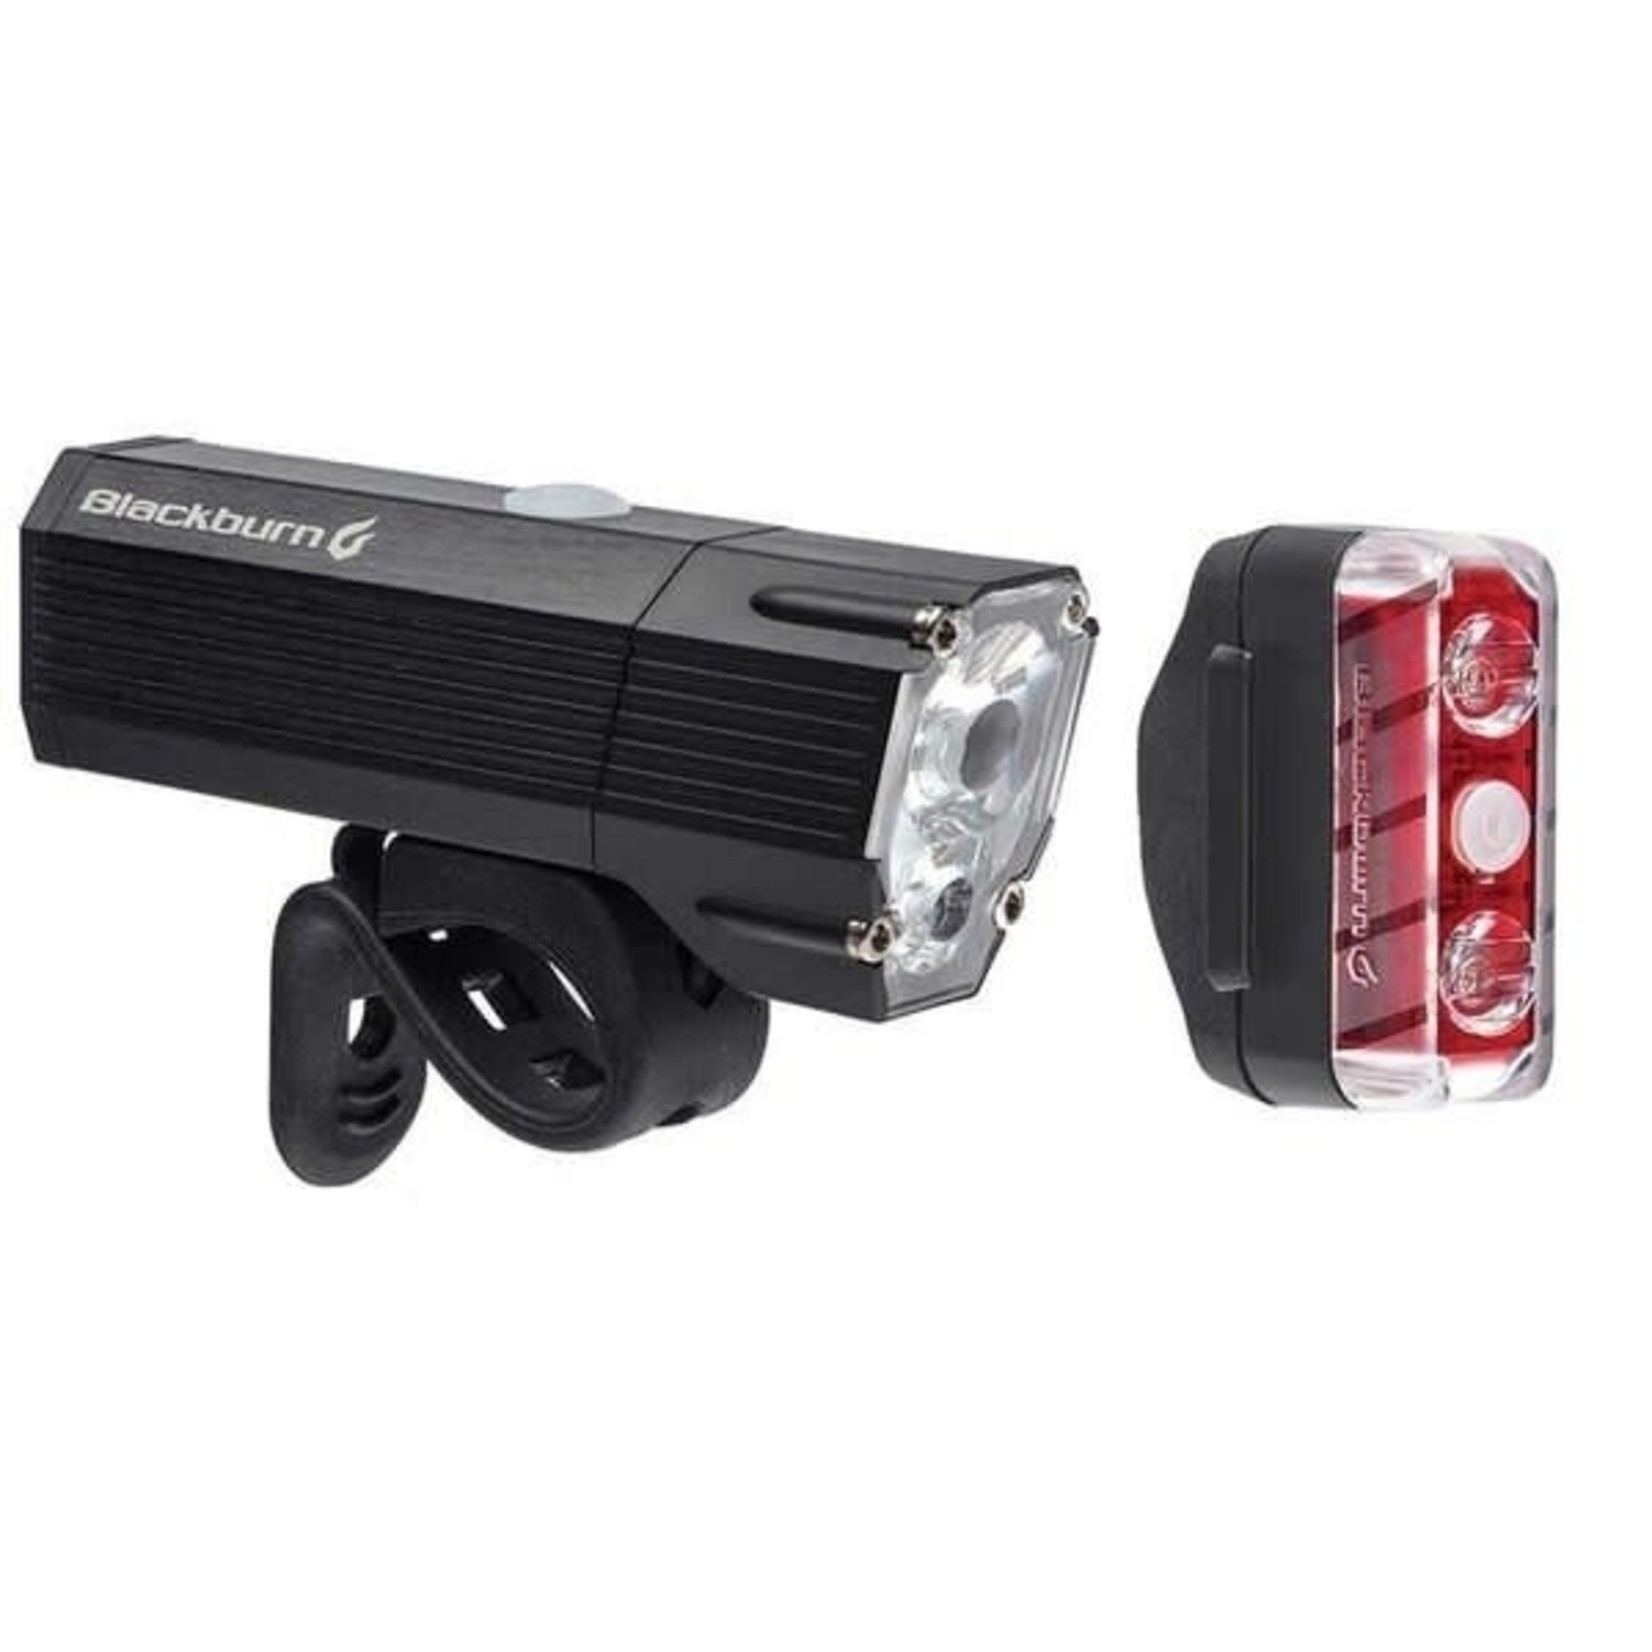 BLACKBURN Bike Lights-BlackBurn, Dayblazer 800 Front and Dayblazer 65 Rear